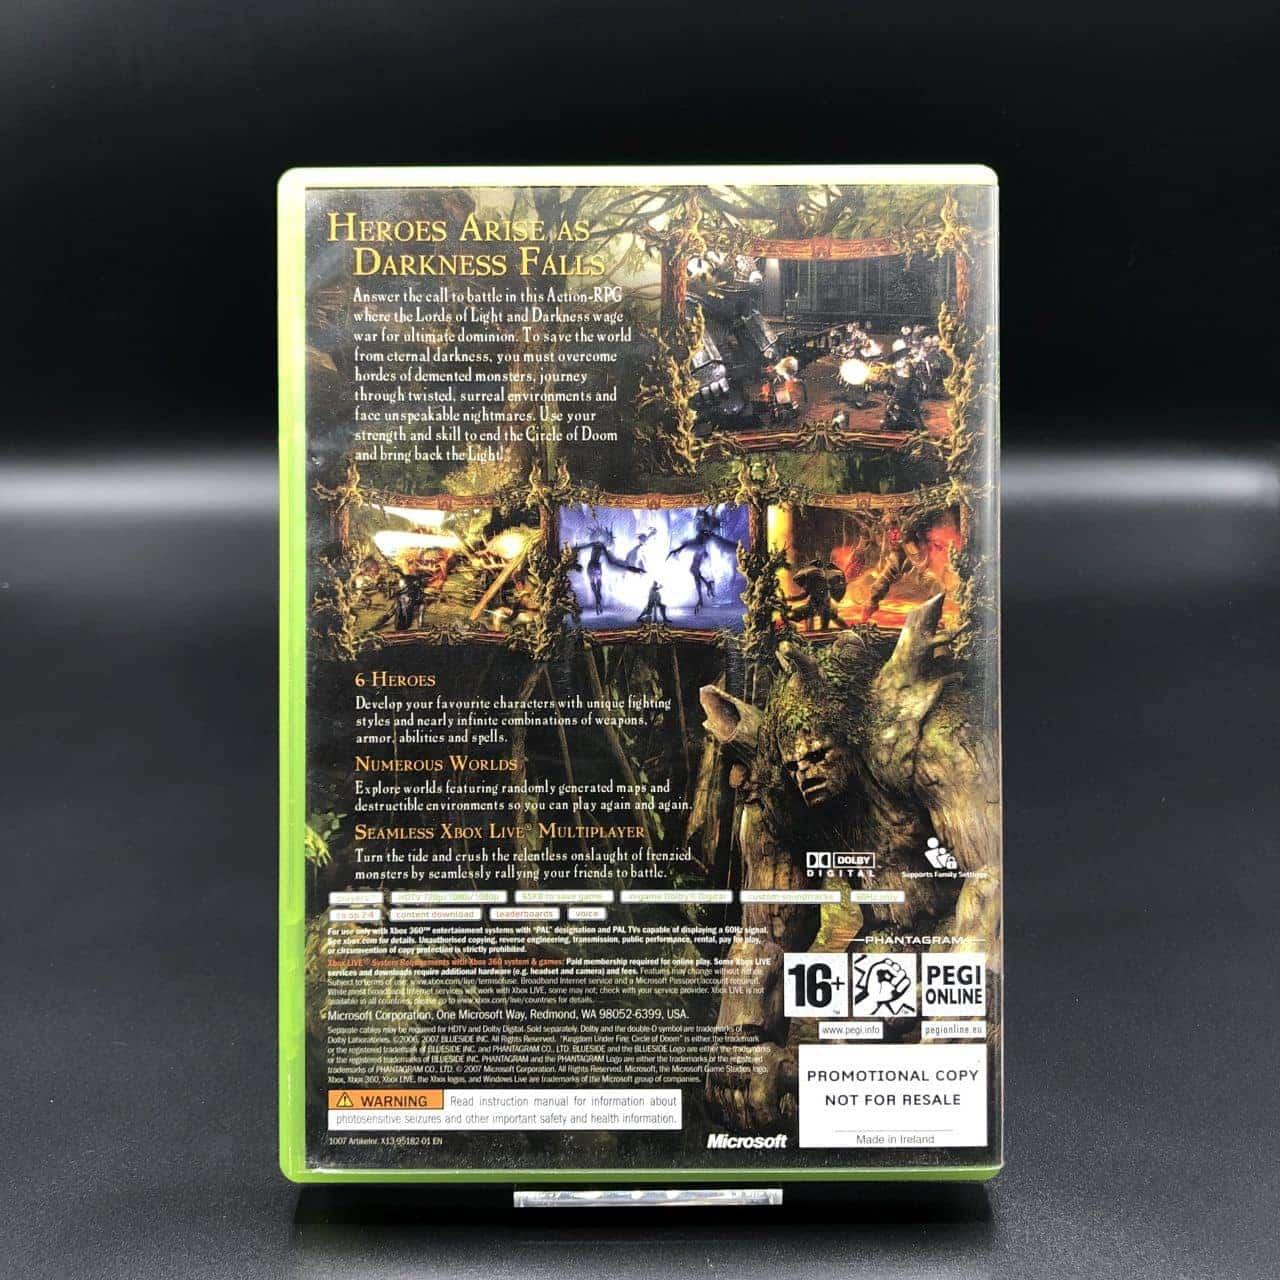 Kingdom Under Fire: Circle of Doom (Promo) (Komplett) (Sehr gut) XBOX 360